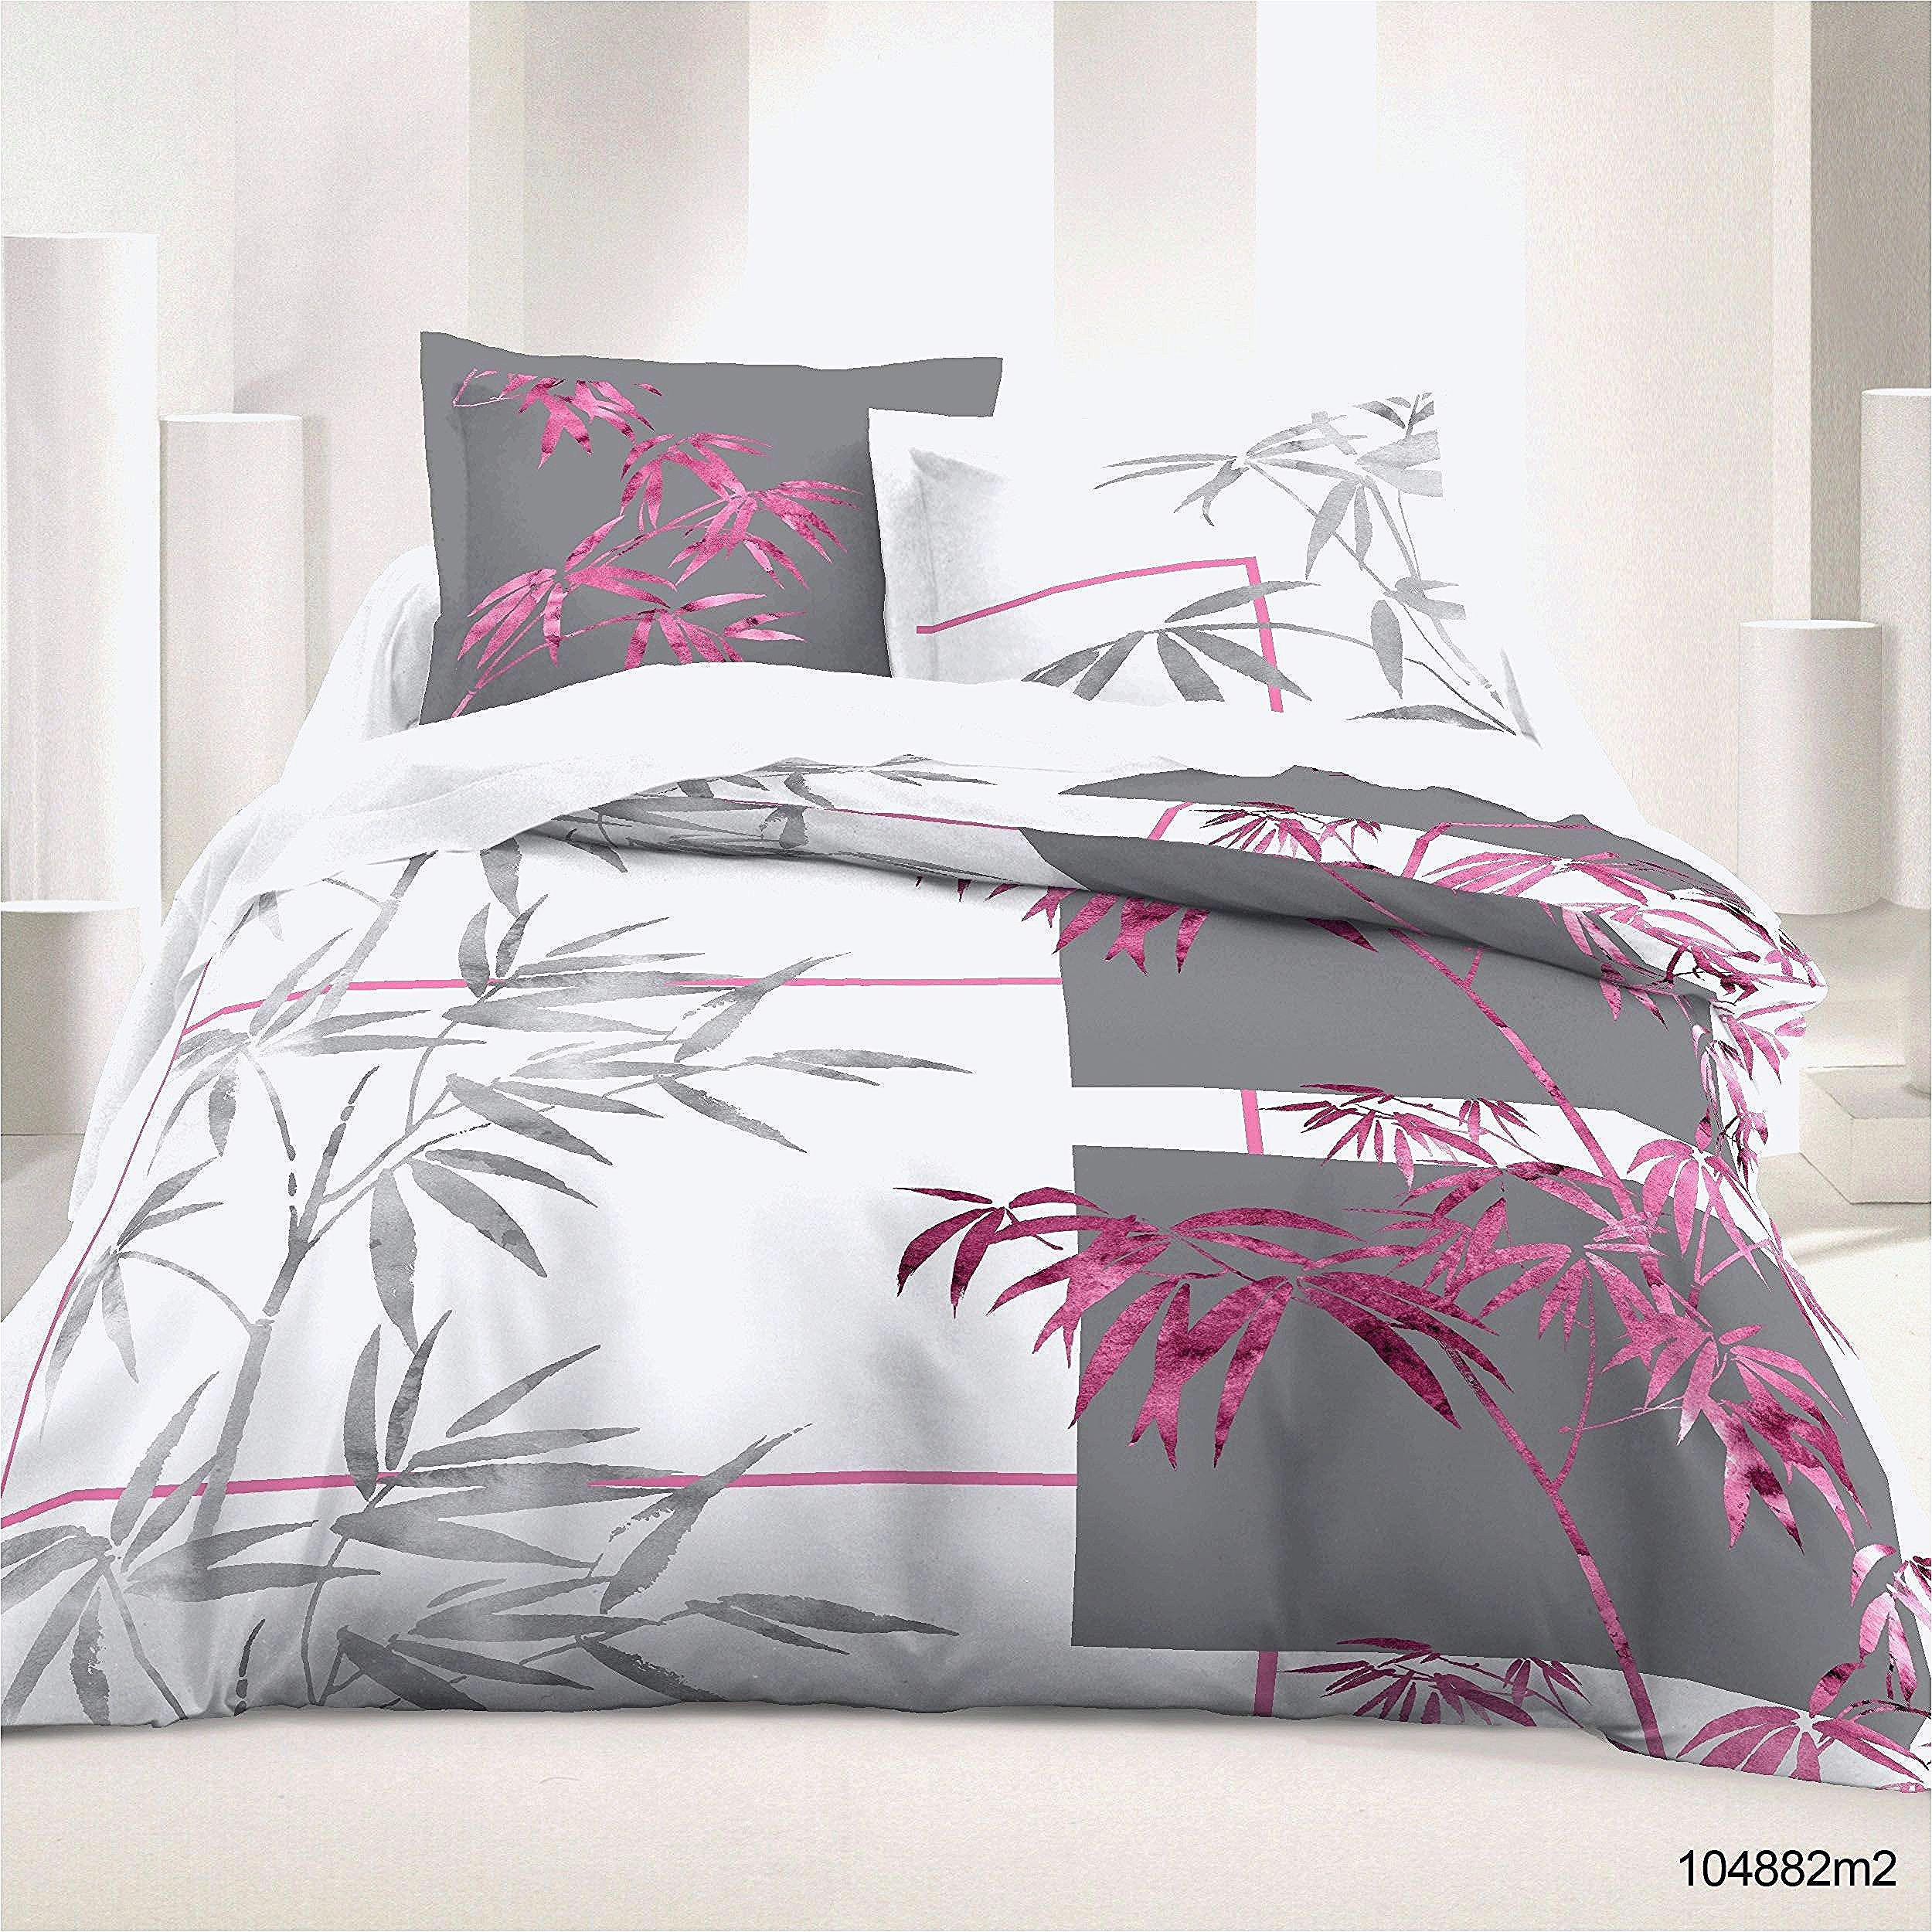 Couette Simple In 2020 Bed Blanket Comforters